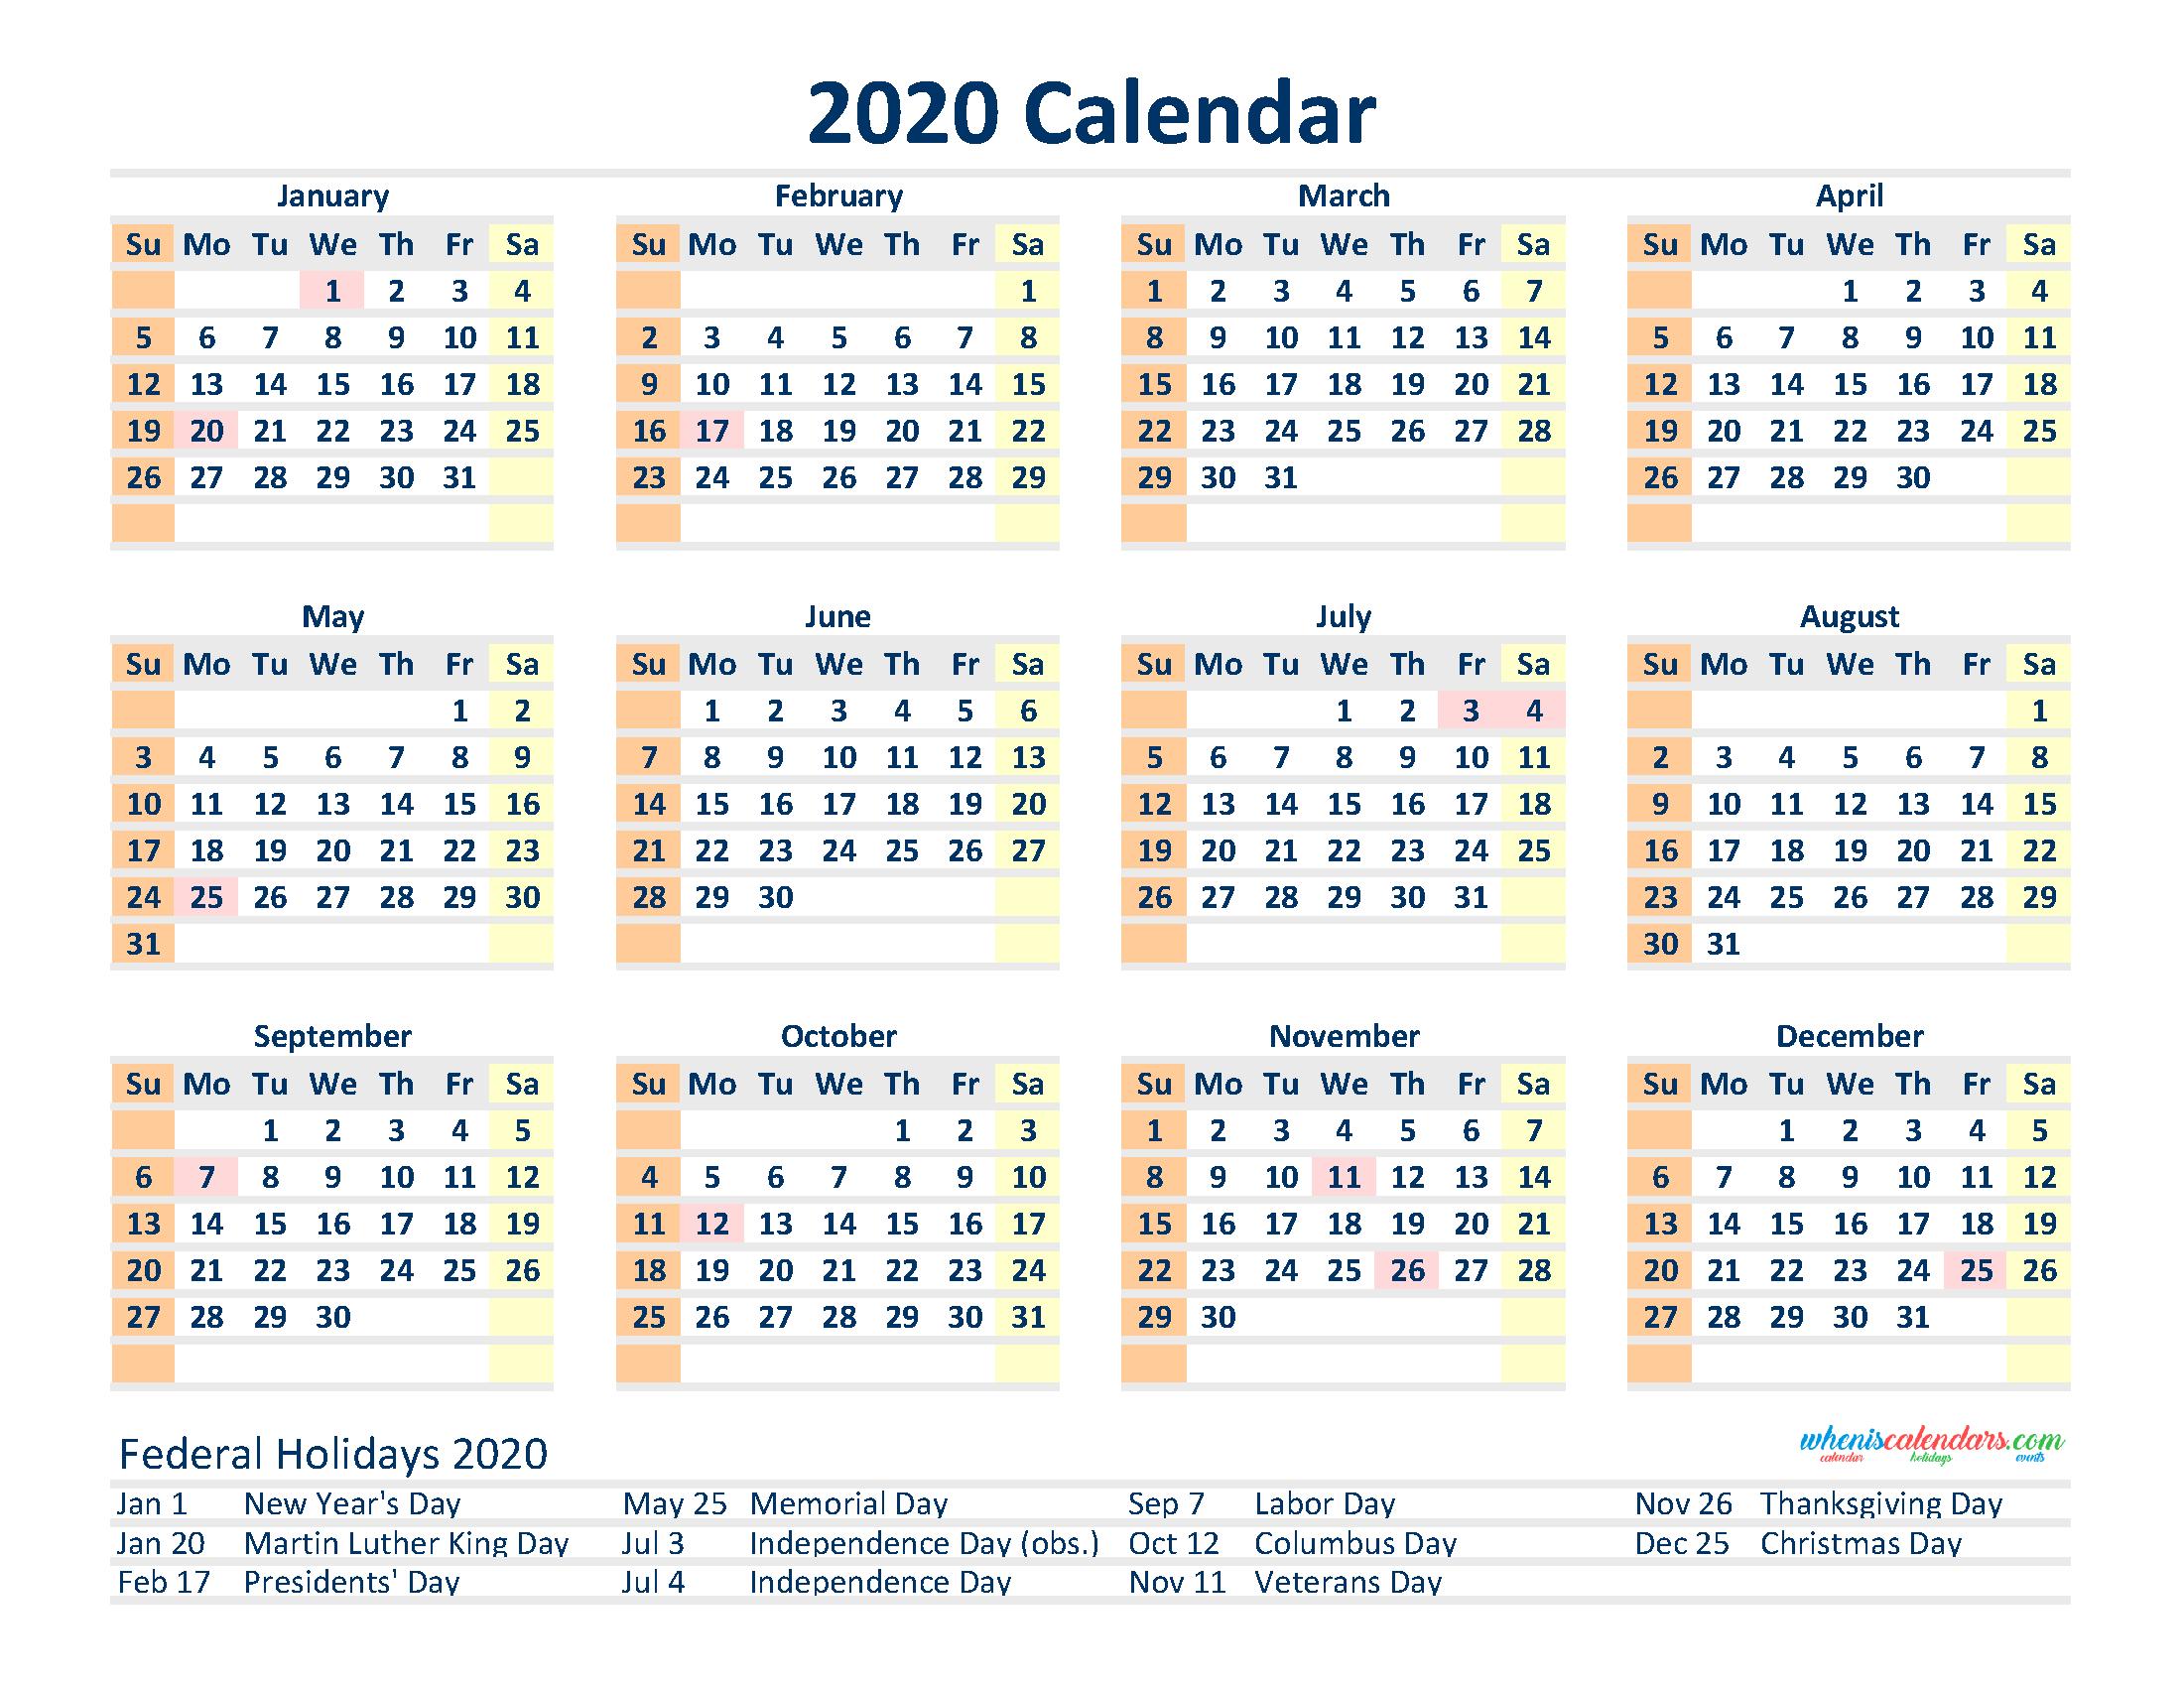 Free 2020 12 Month Calendar Printable Pdf, Excel, Image Printable And Editable 12 Month Calendars